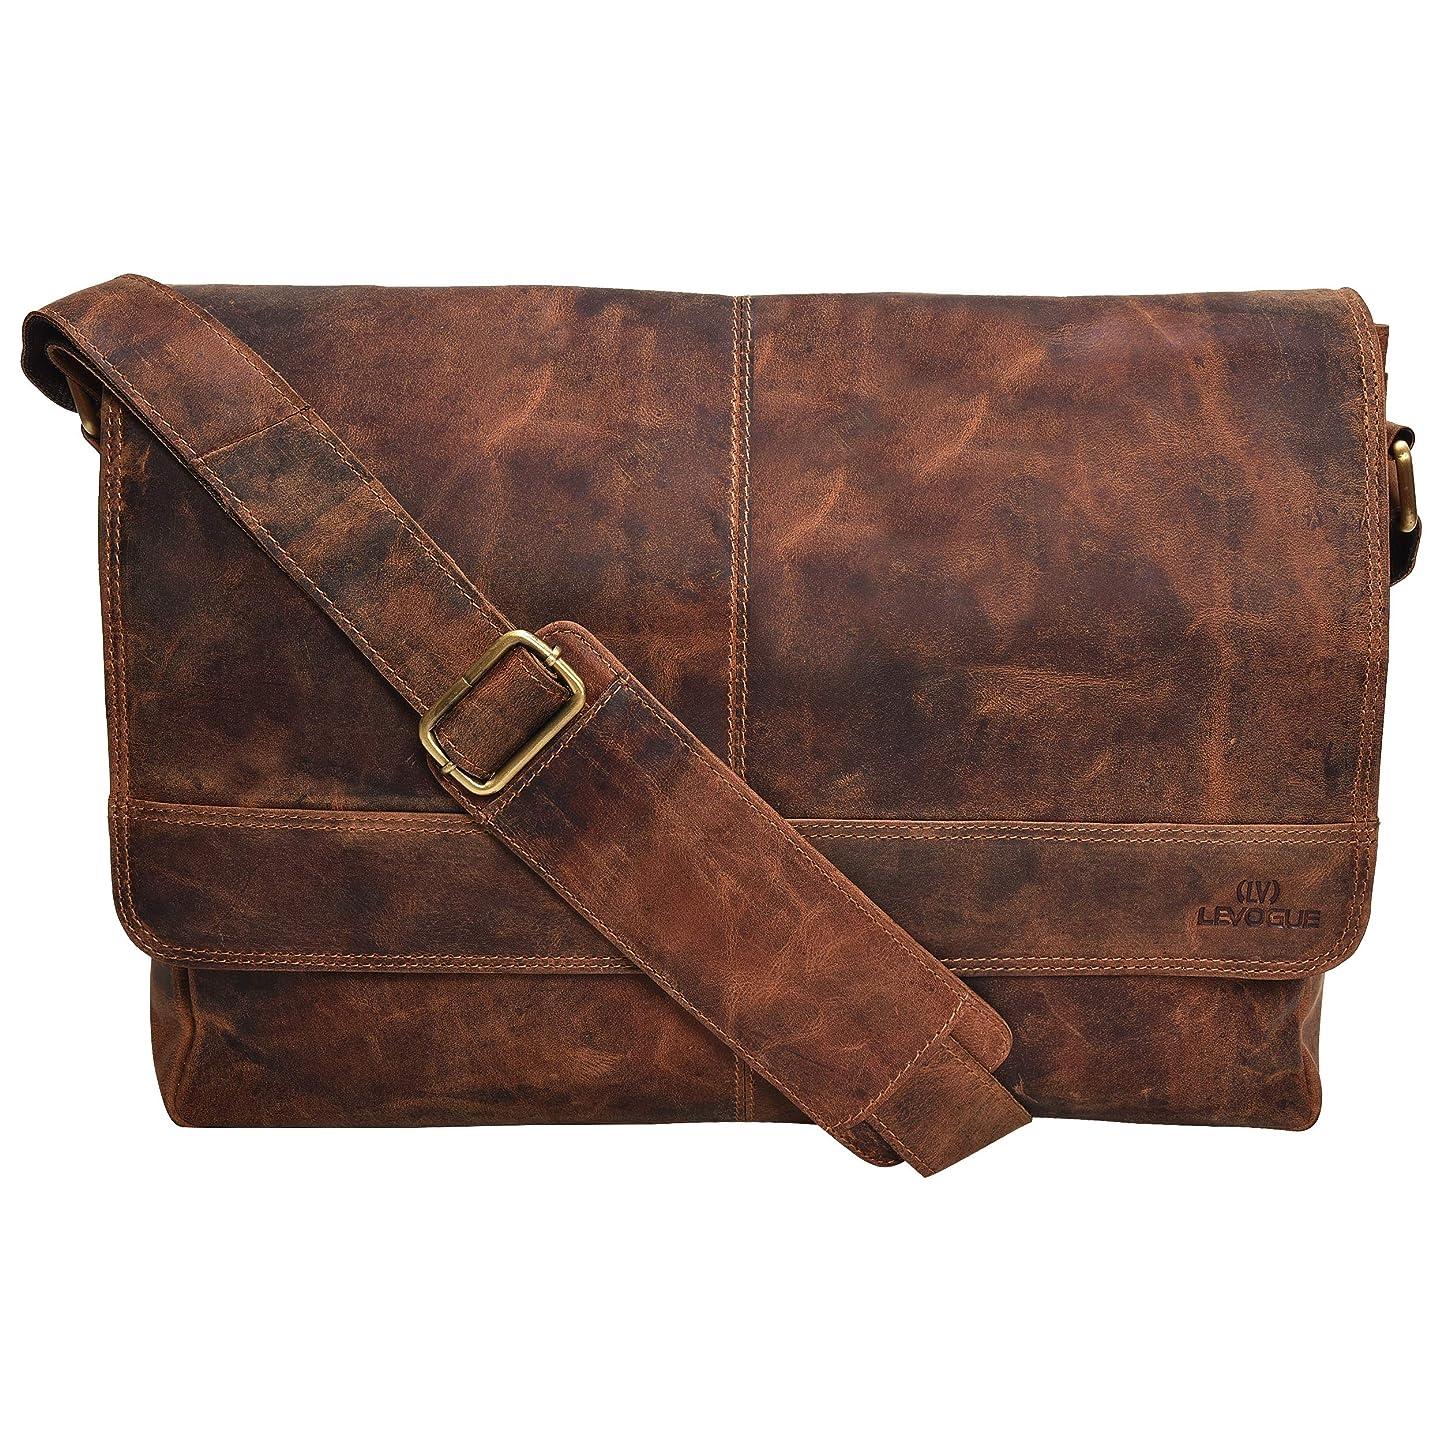 Genuine Leather Messenger Bag for Men and Women - 14 inch Laptop Bag for College Work Office by LEVOGUE (COGNAC VINTAGE) bkotlpigiqx4